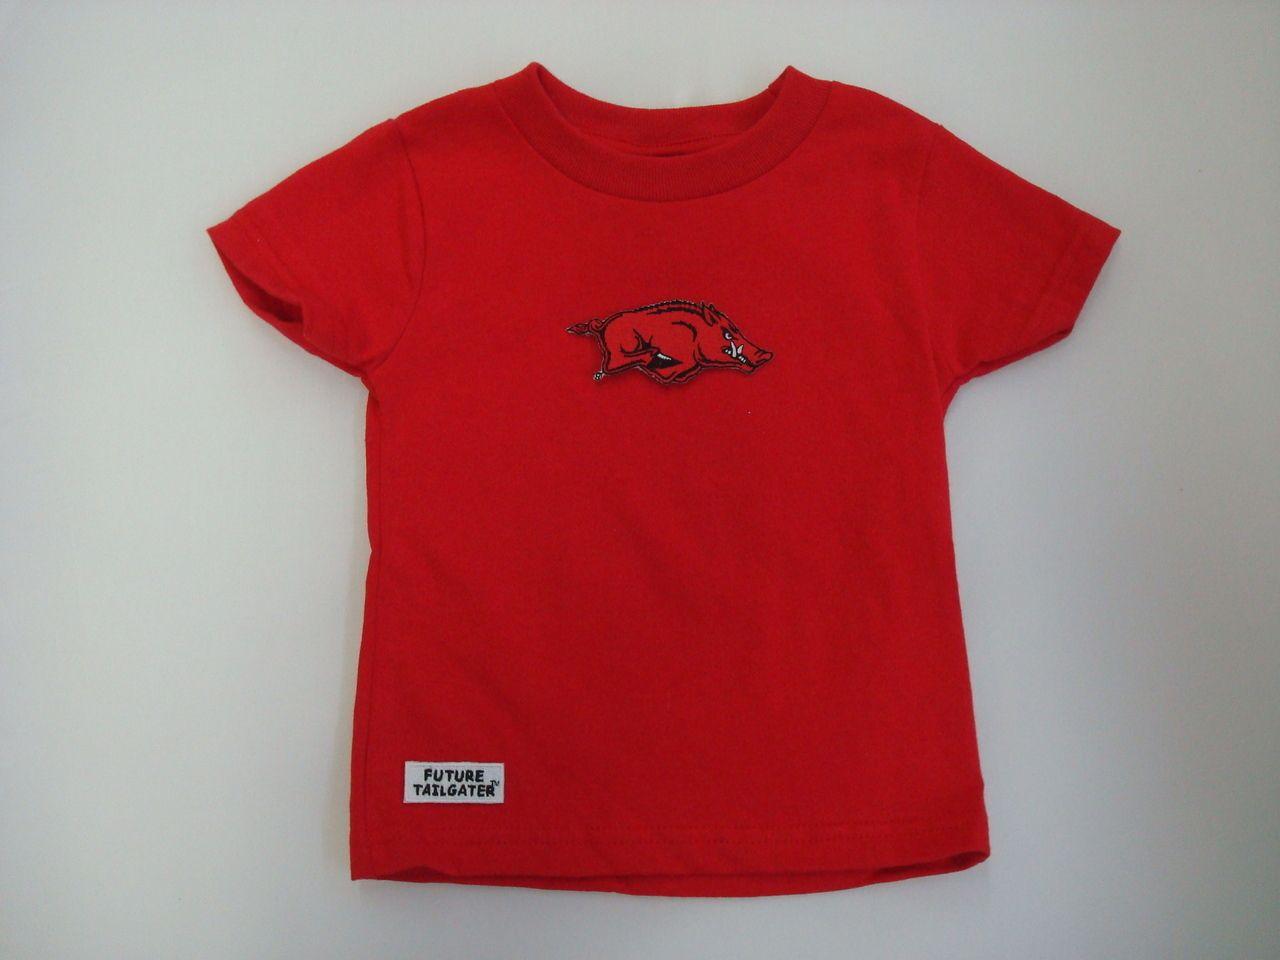 7f9eeef53 Clothing Dresses & Skirts Future Tailgater Arkansas Razorback Baby Onesie  Dress DHM Kids